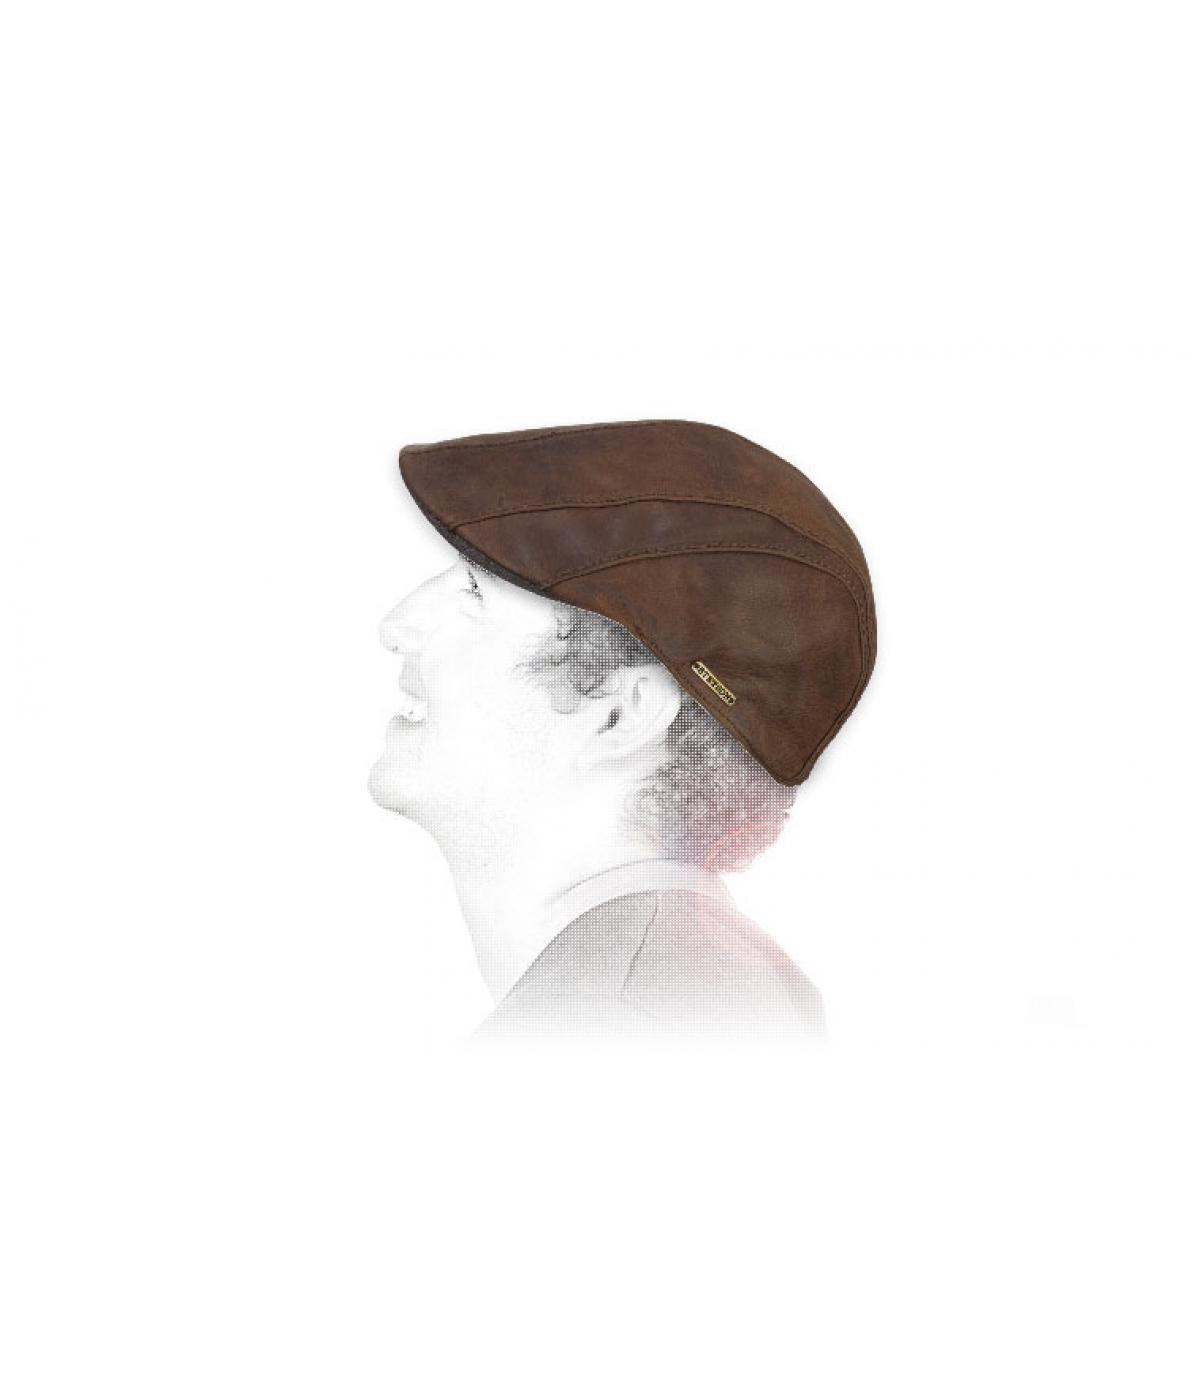 boina de cuero de cabra Stetson